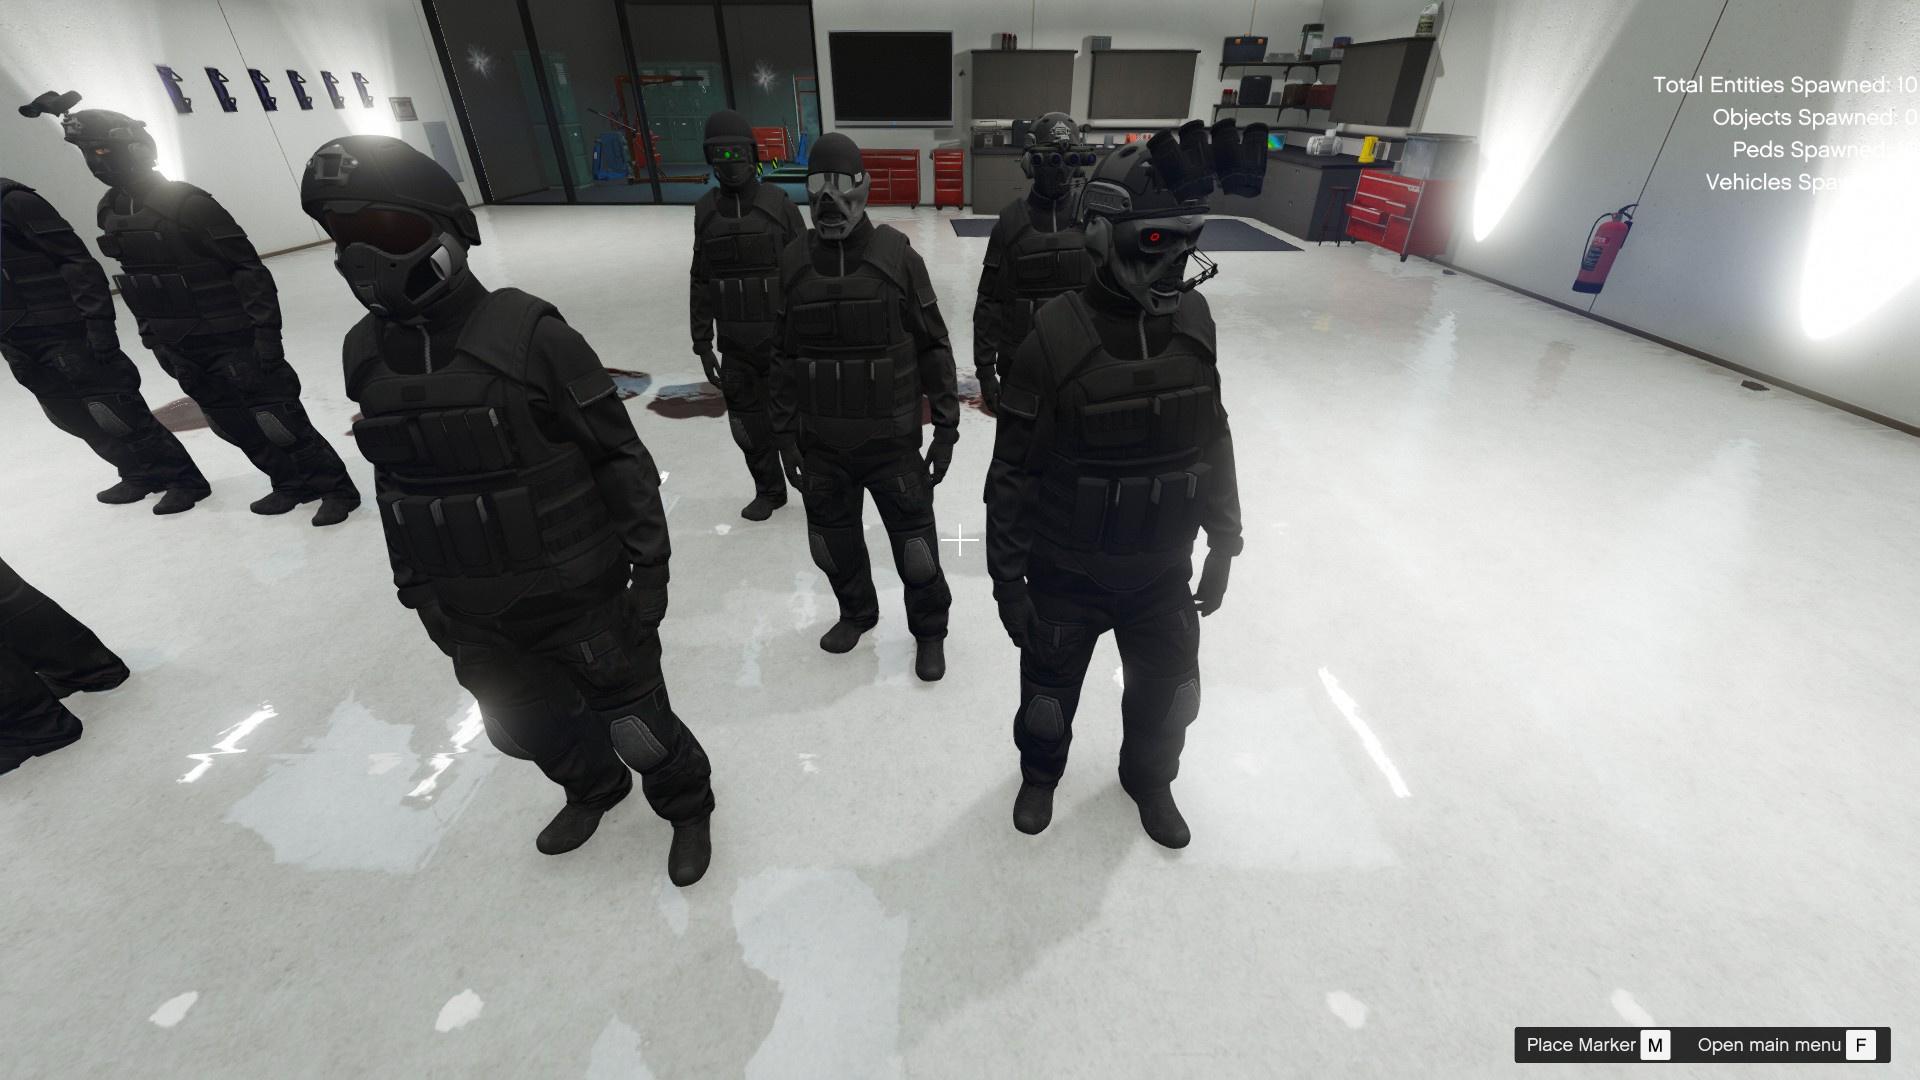 Black Ops/Juggernaut Outfit Pack [Menyoo] - GTA5-Mods com